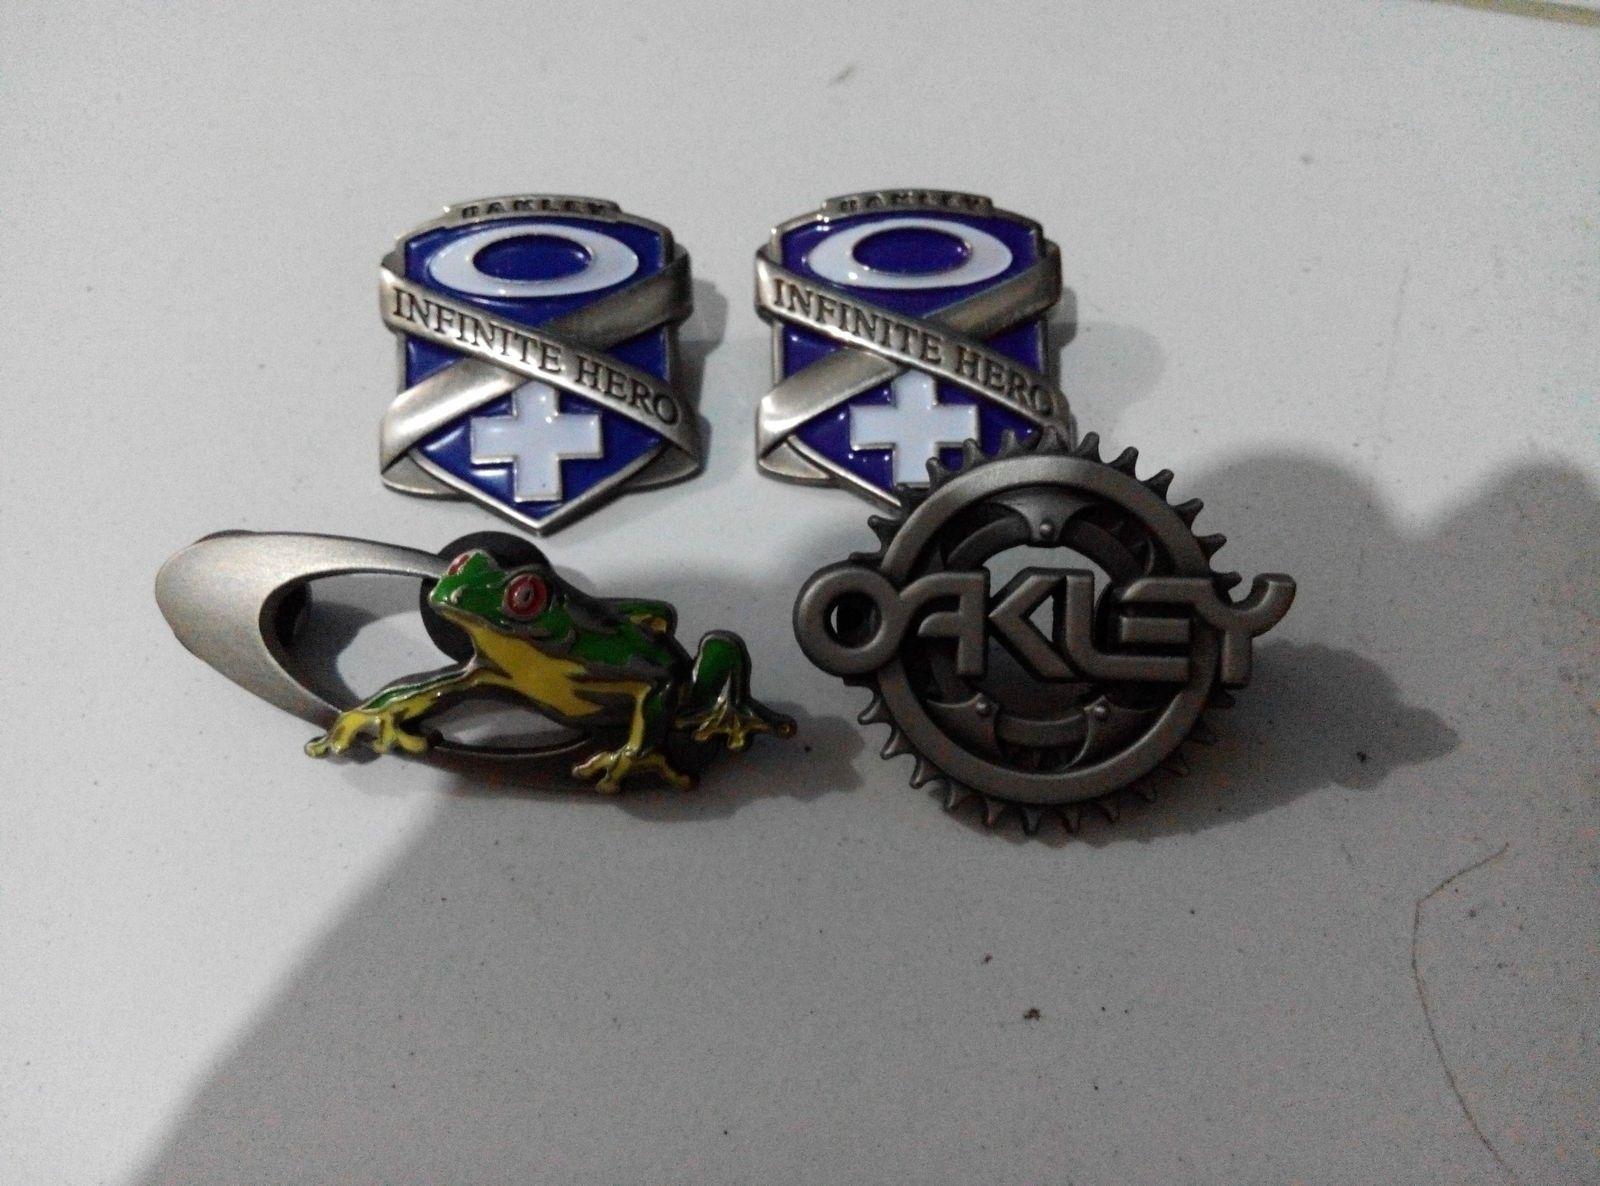 Pins - IMG_20150603_212003.jpg